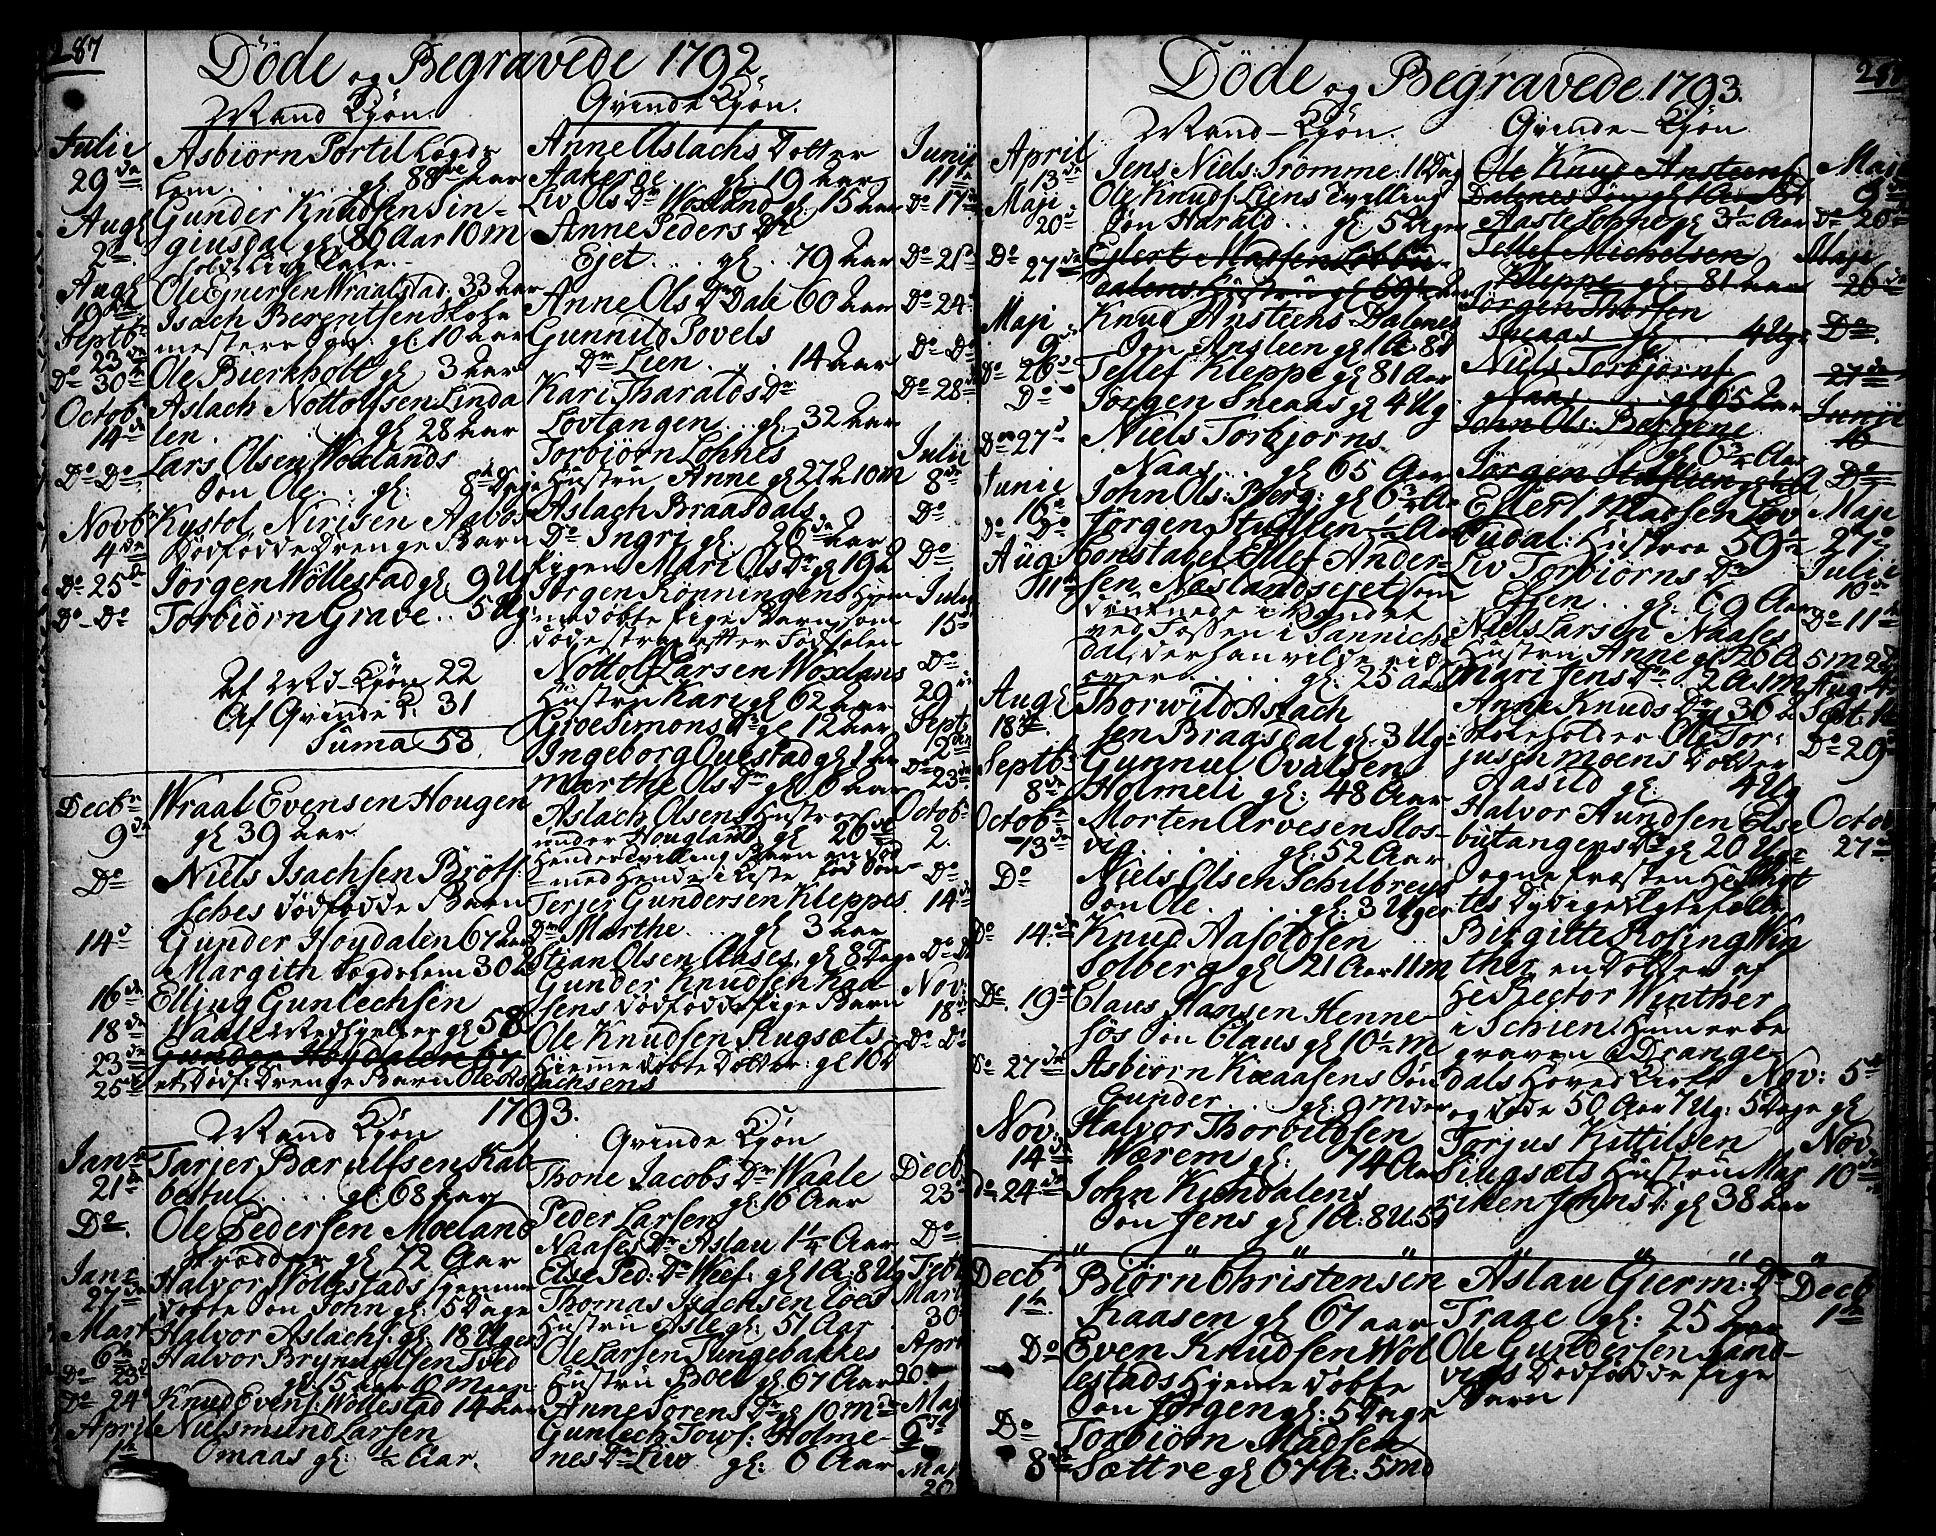 SAKO, Drangedal kirkebøker, F/Fa/L0003: Ministerialbok nr. 3, 1768-1814, s. 287-288